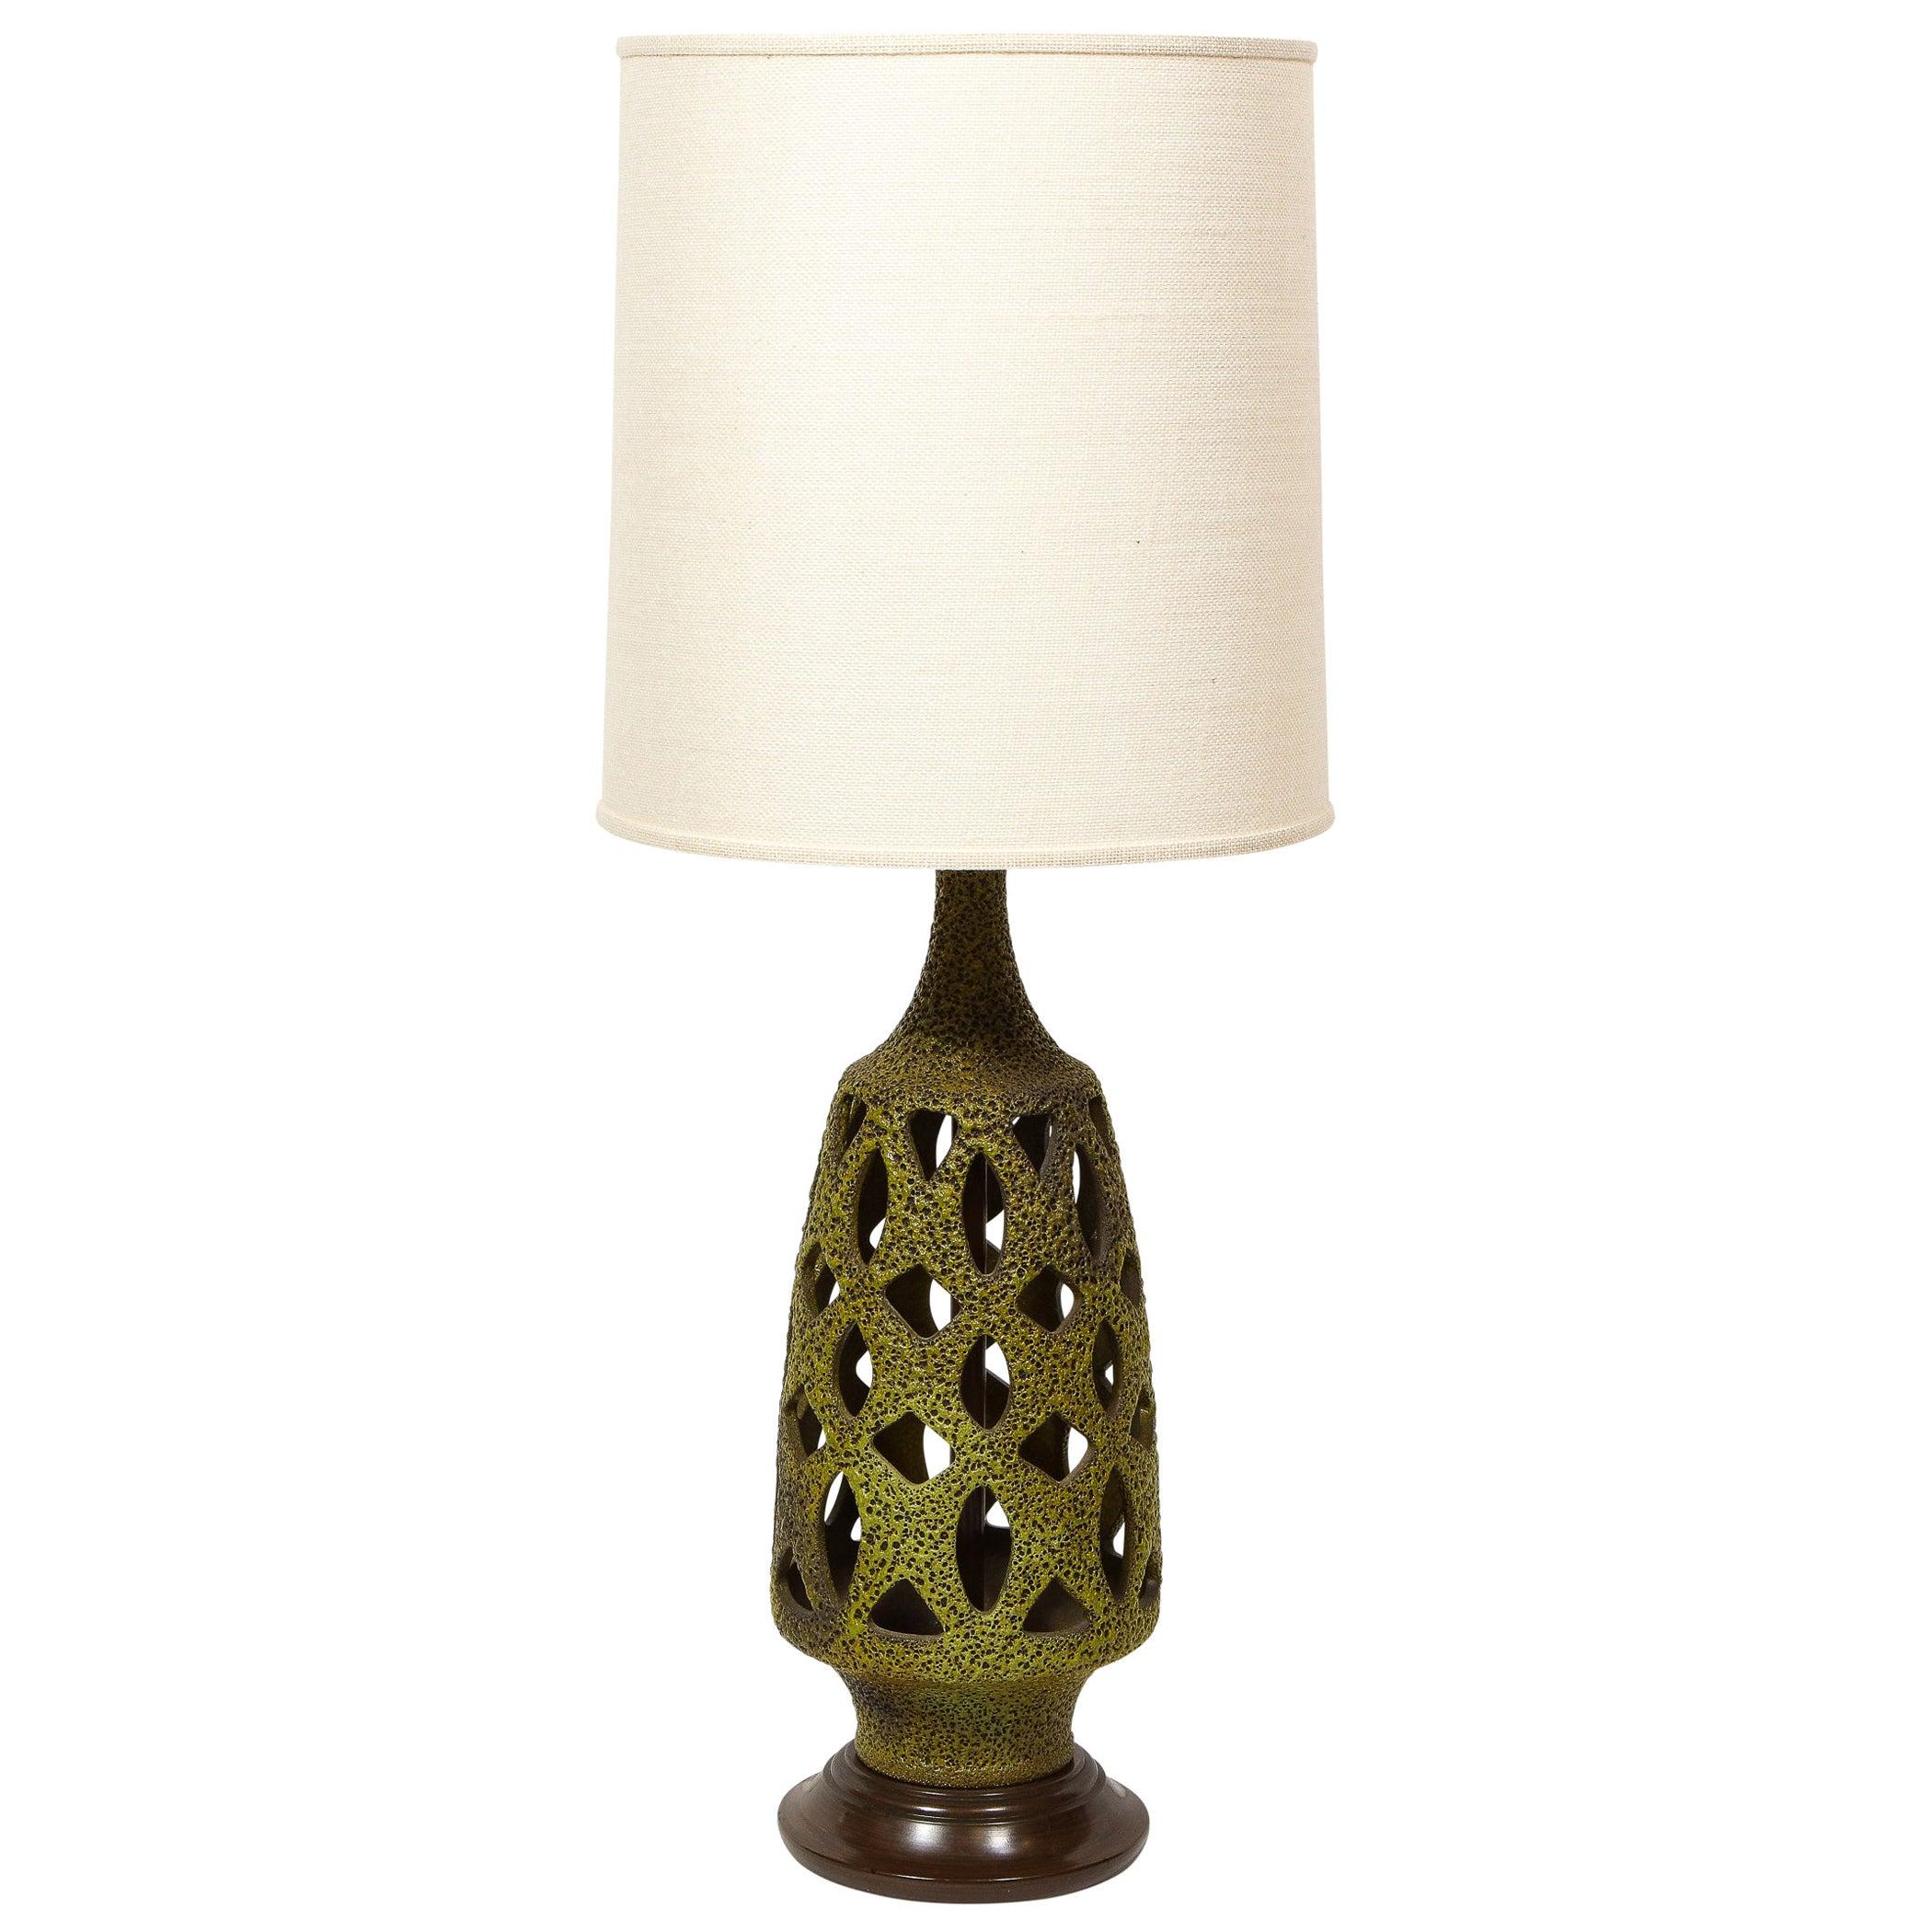 Midcentury Organic Modern Sculptural Latticework Table Lamp